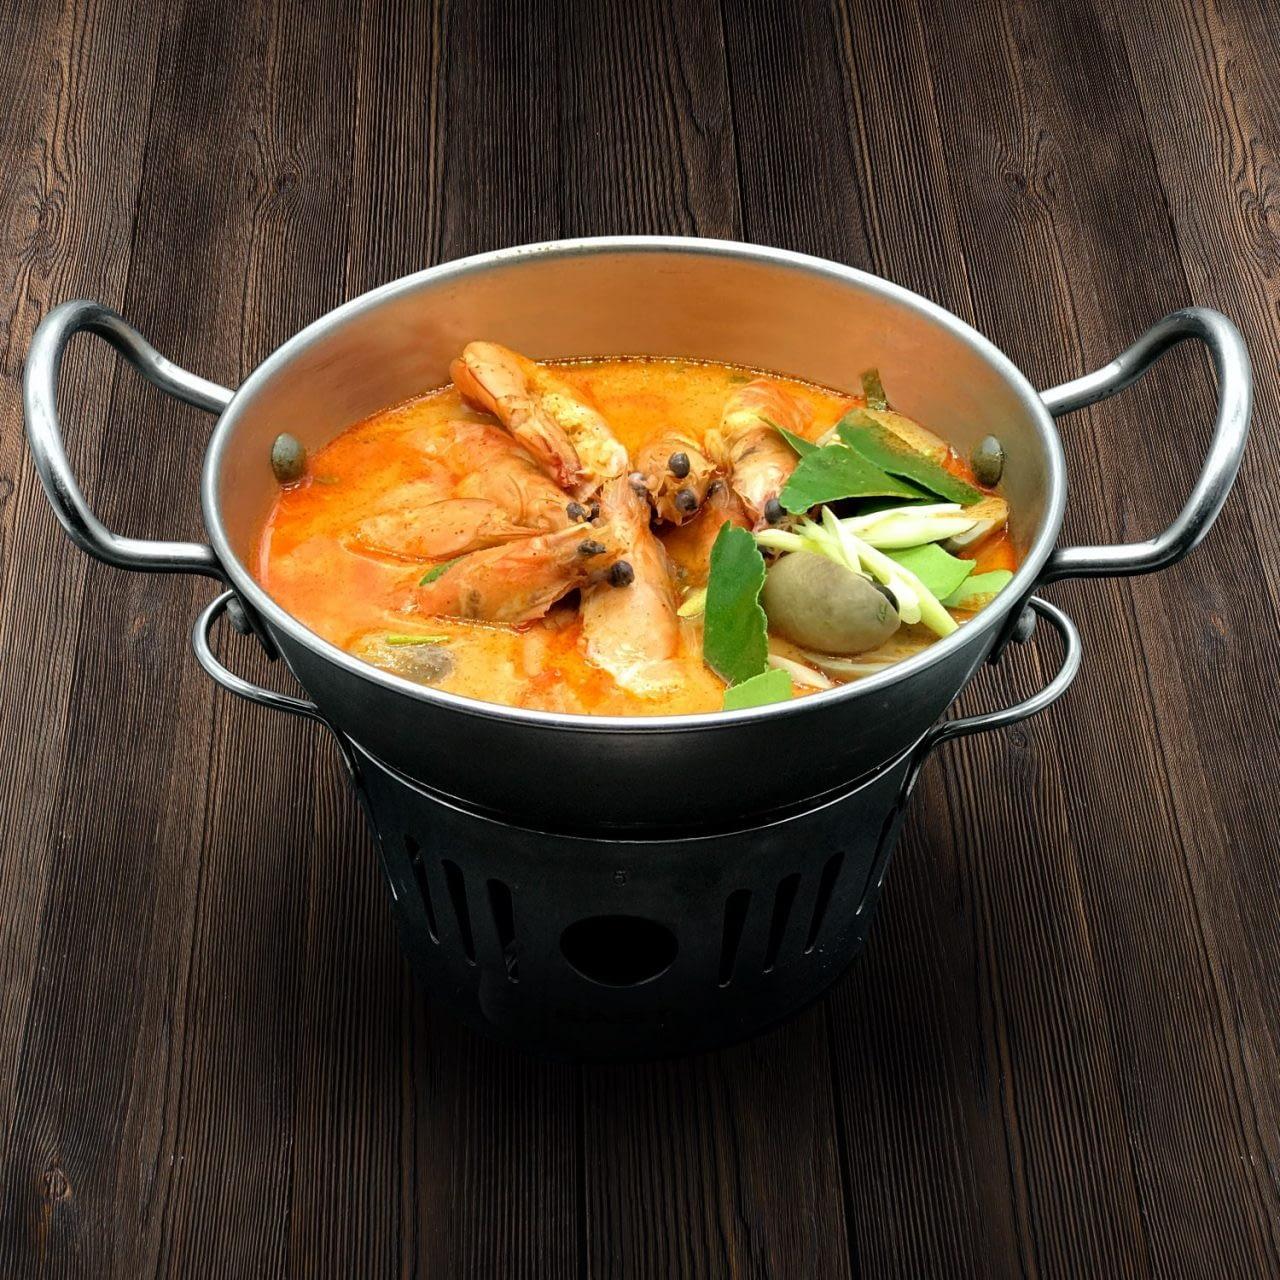 Thai Food Delivery Kuala Lumpur Spicy Tom Yam Prawn Soup